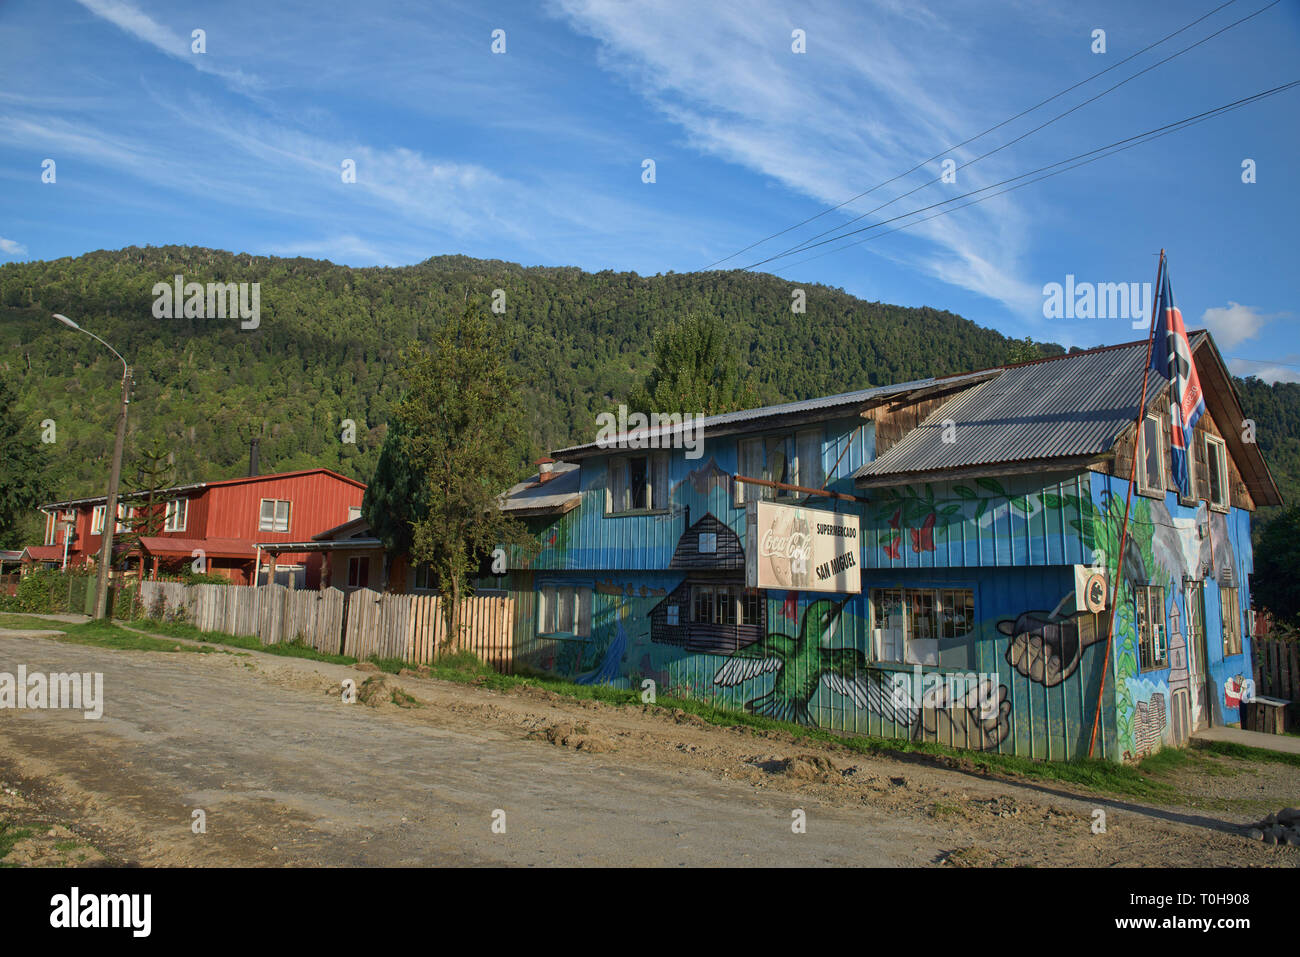 Small town life, Puyuhuapi, Carretera Austral, Patagonia, Aysen, Chile - Stock Image